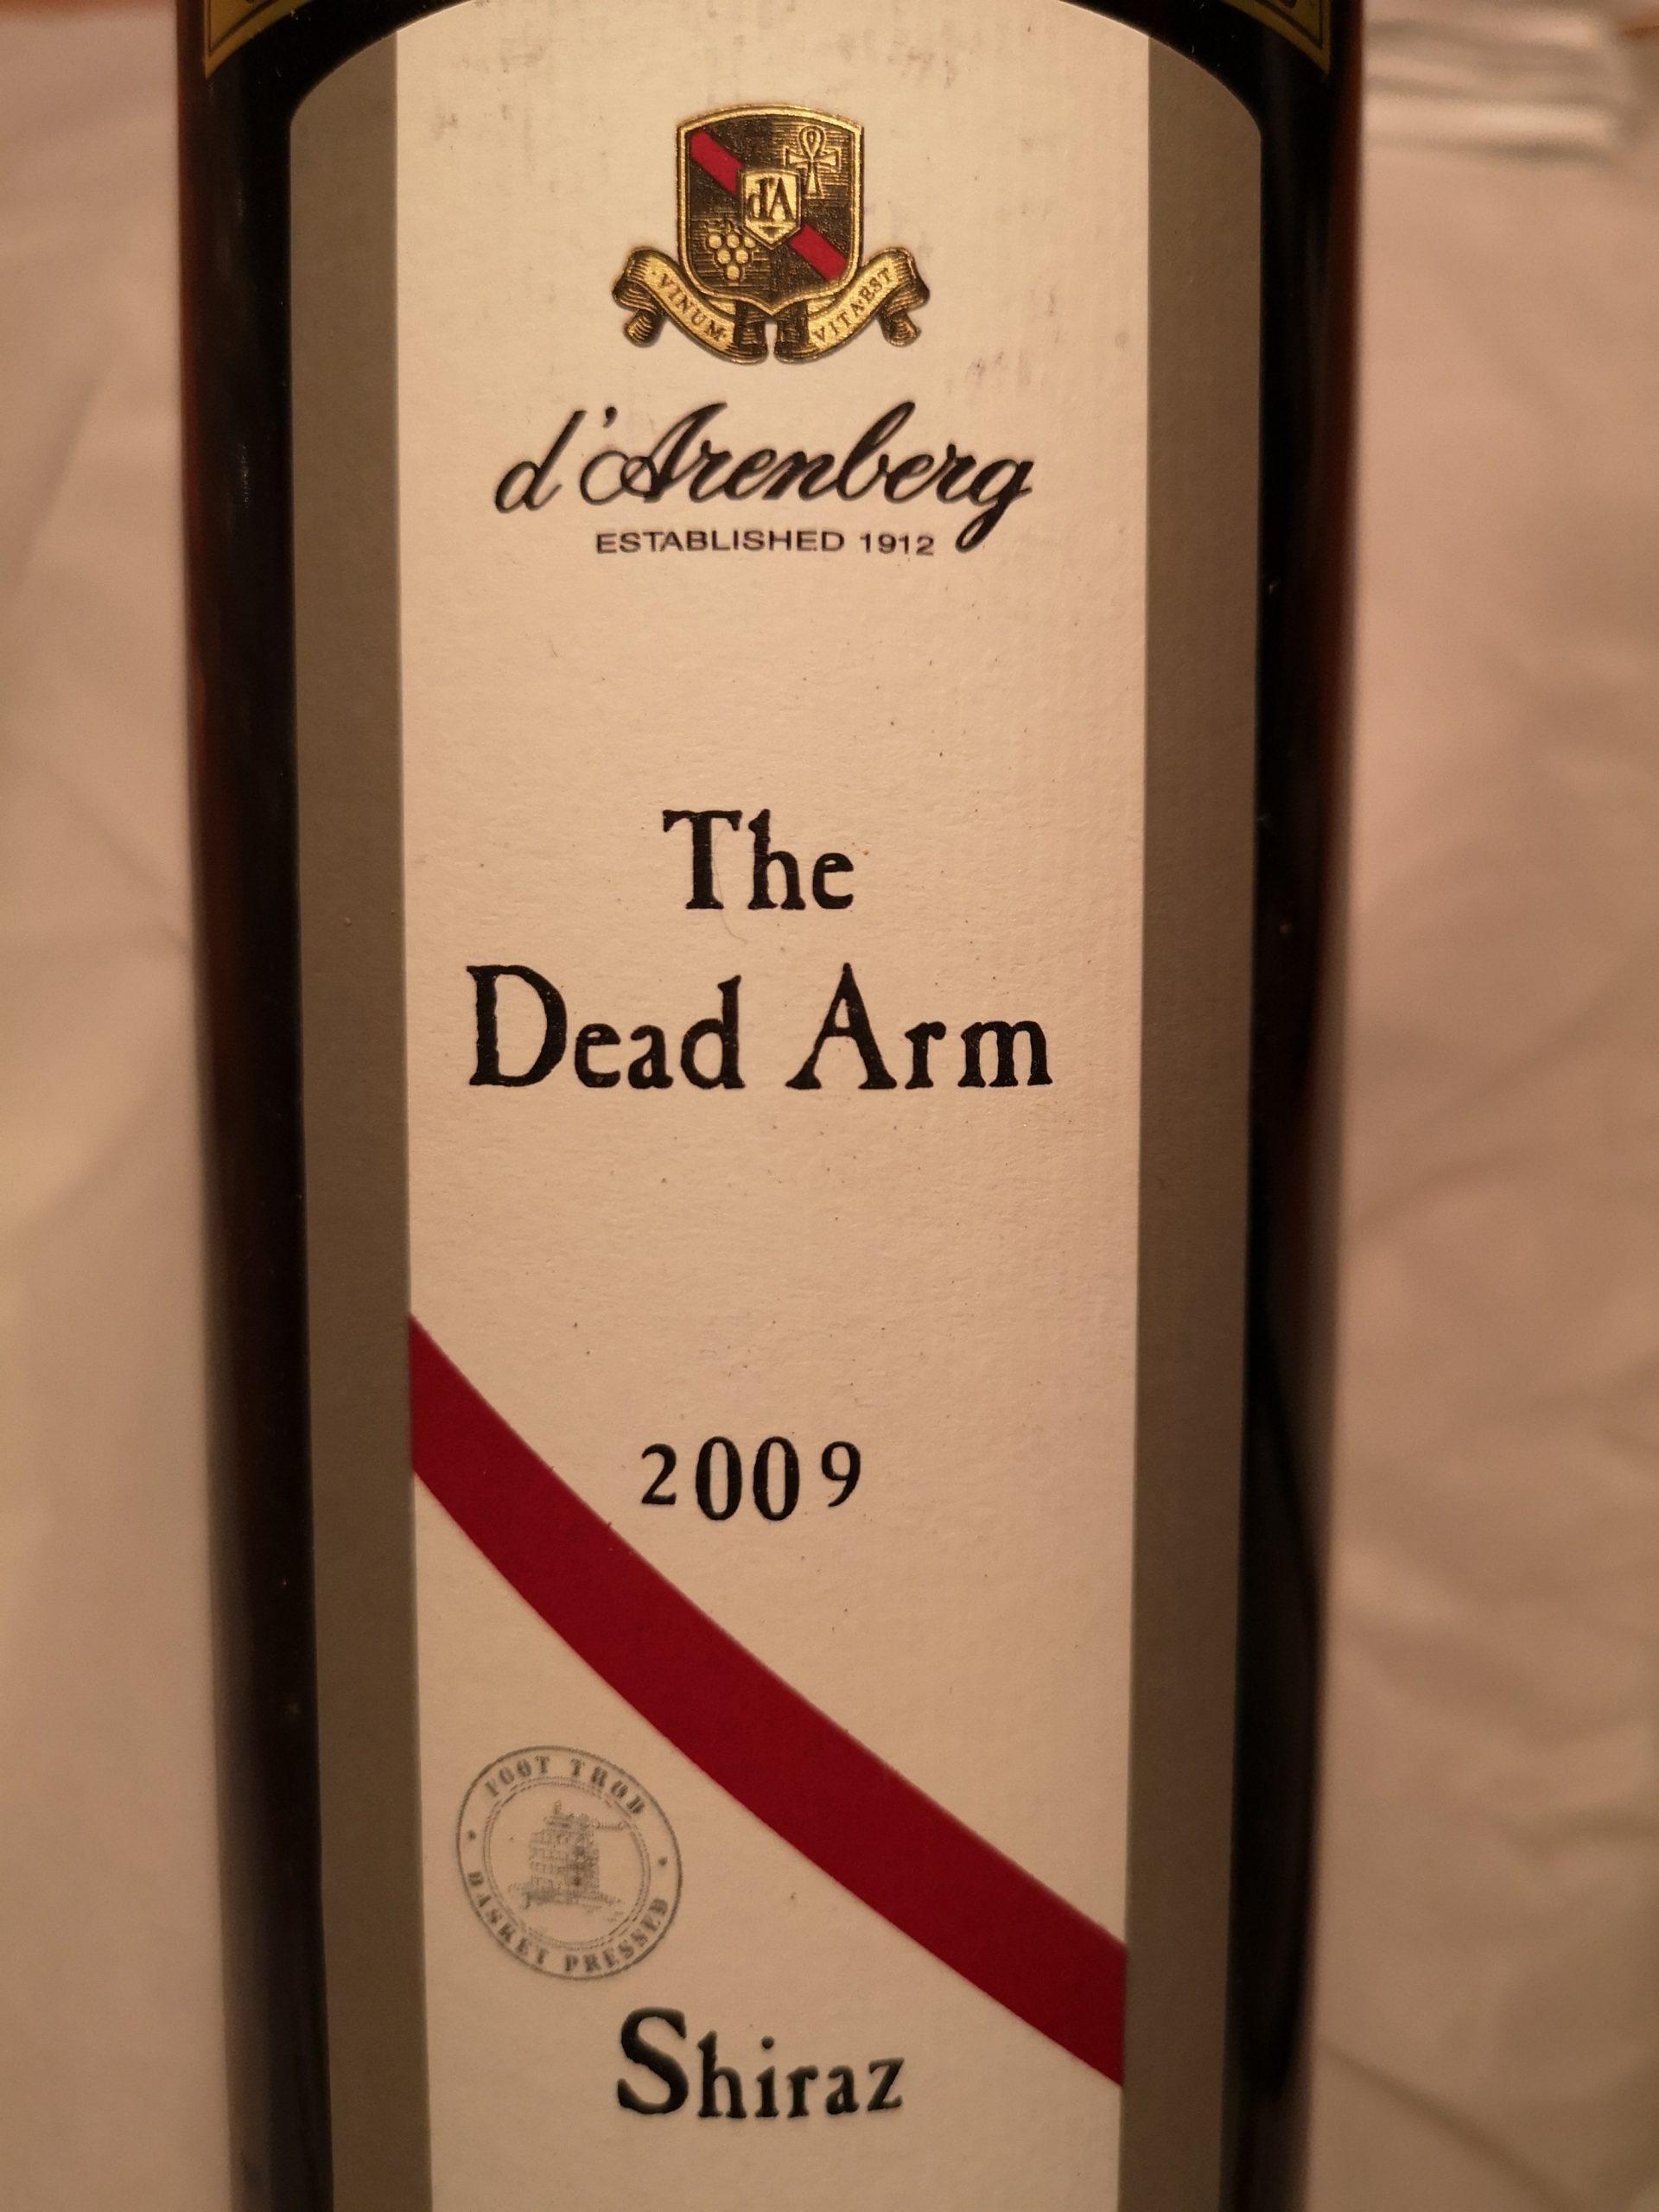 2009 Shiraz The Dead Arm | d'Arenberg